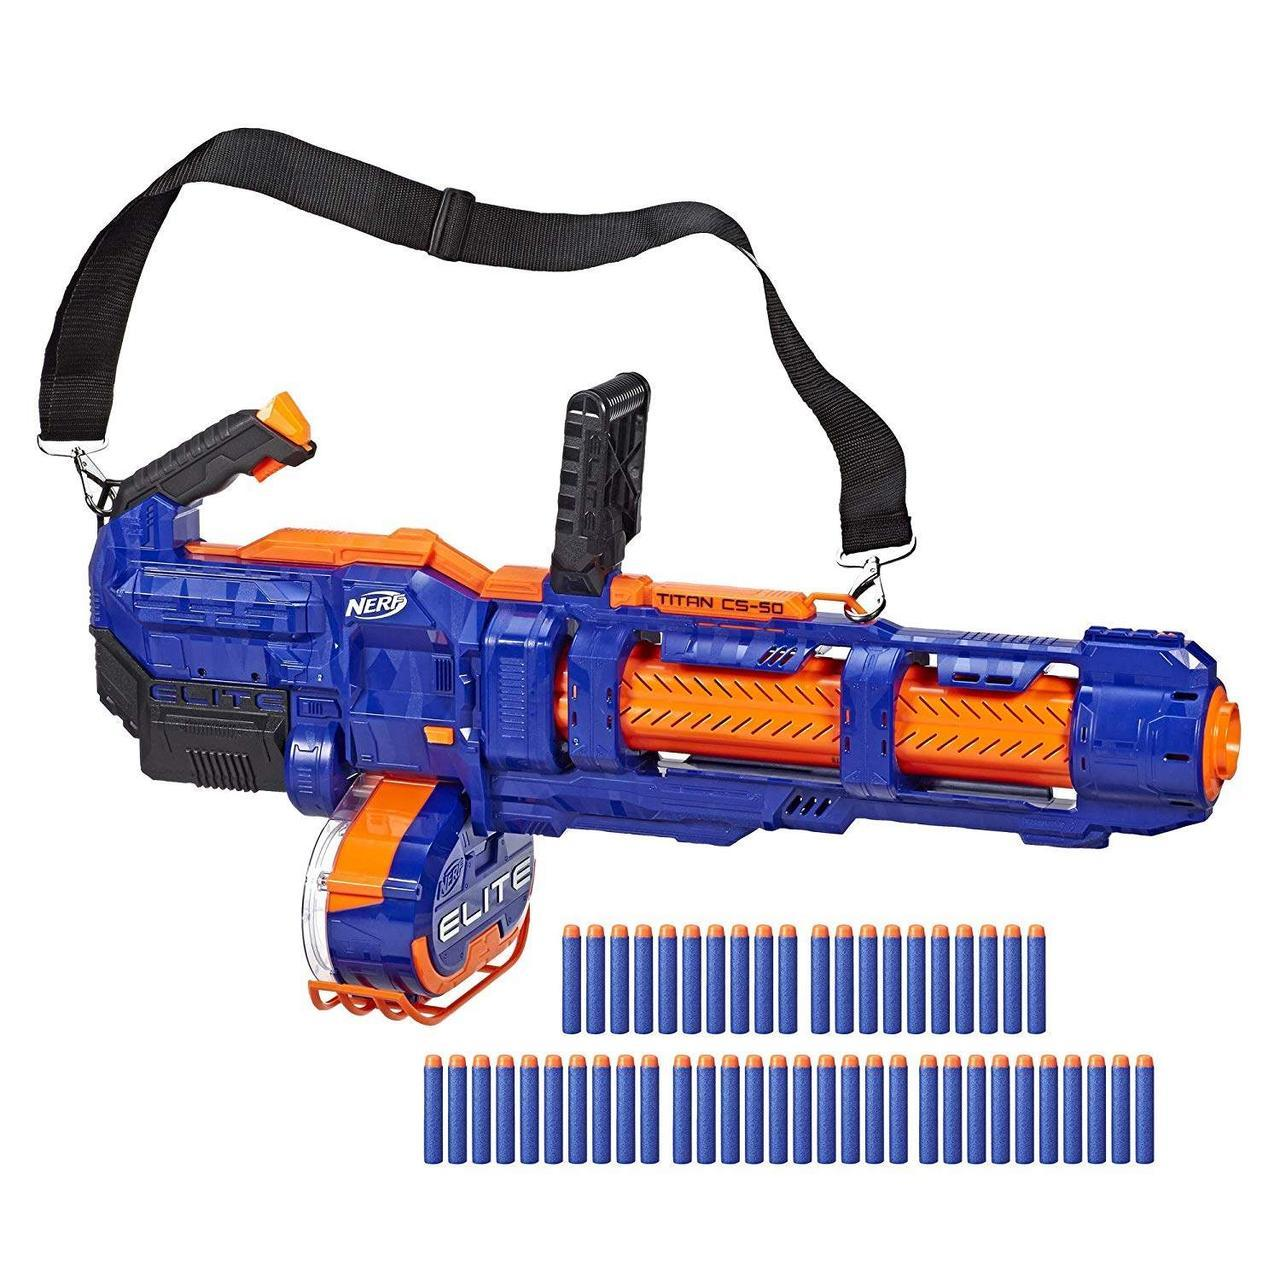 Hasbro Nerf N-Strike Elite Автоматический Бластер Титан CS-50 (Titan CS-50), Пулемёт Миниган Нёрф